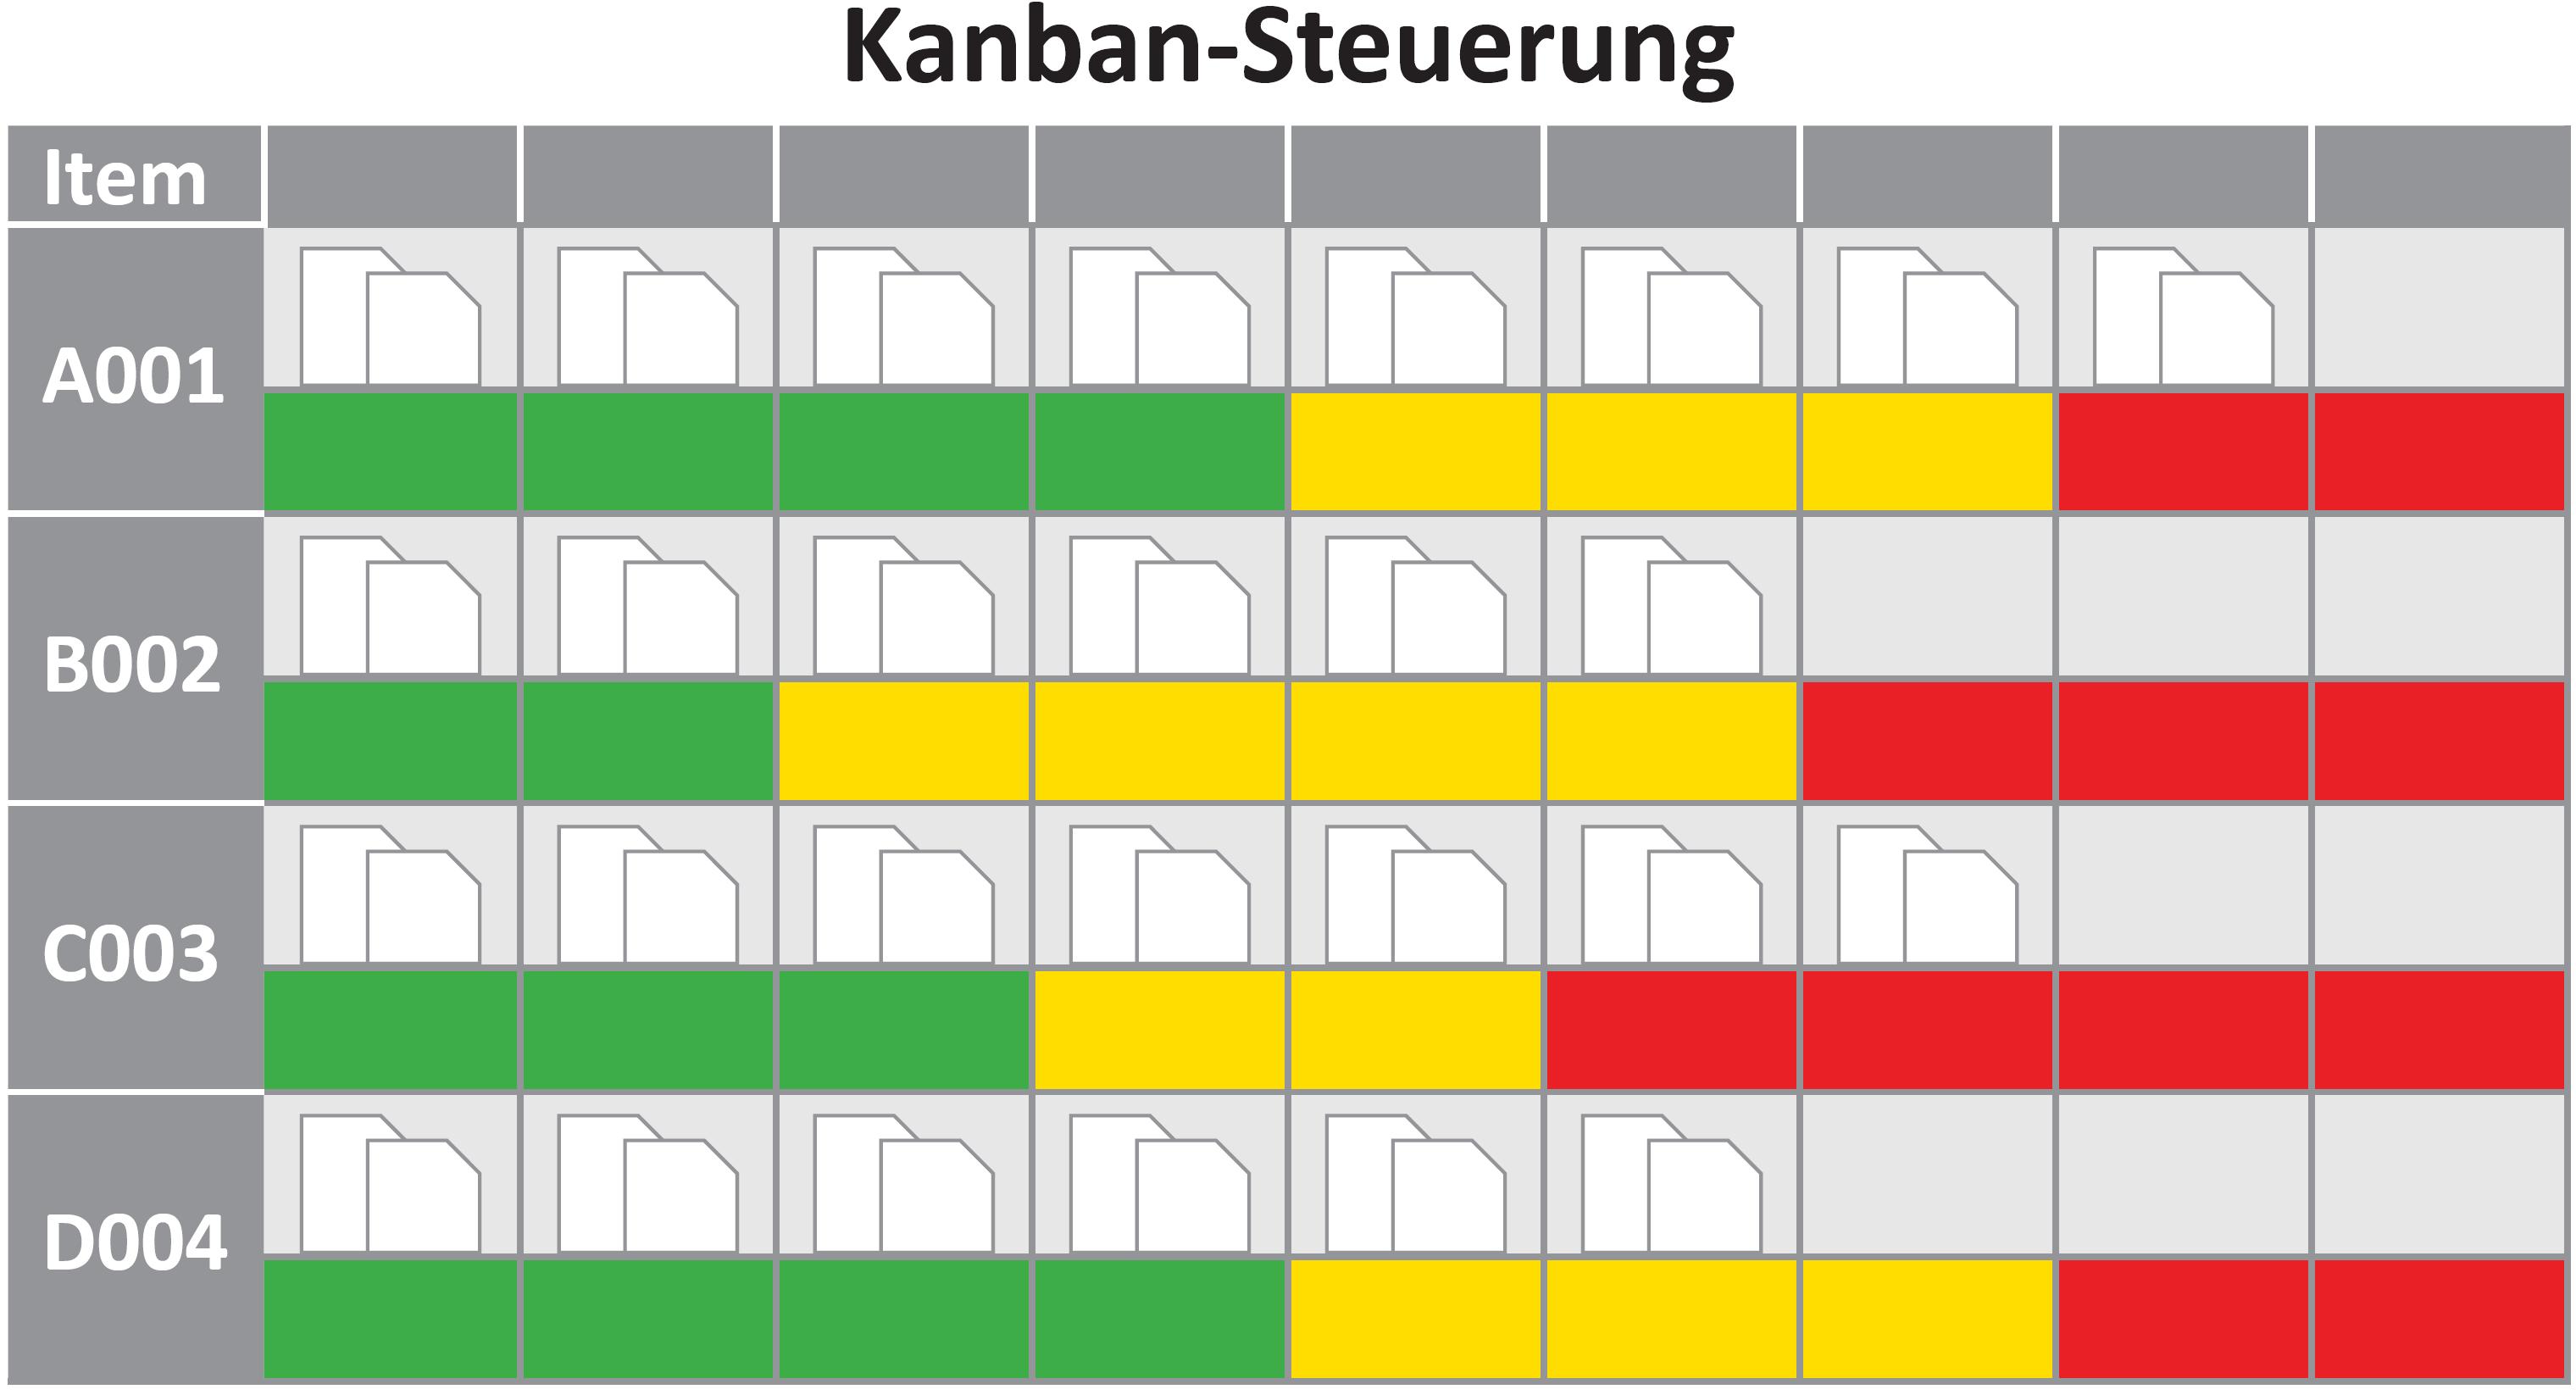 Kanban Steuerung